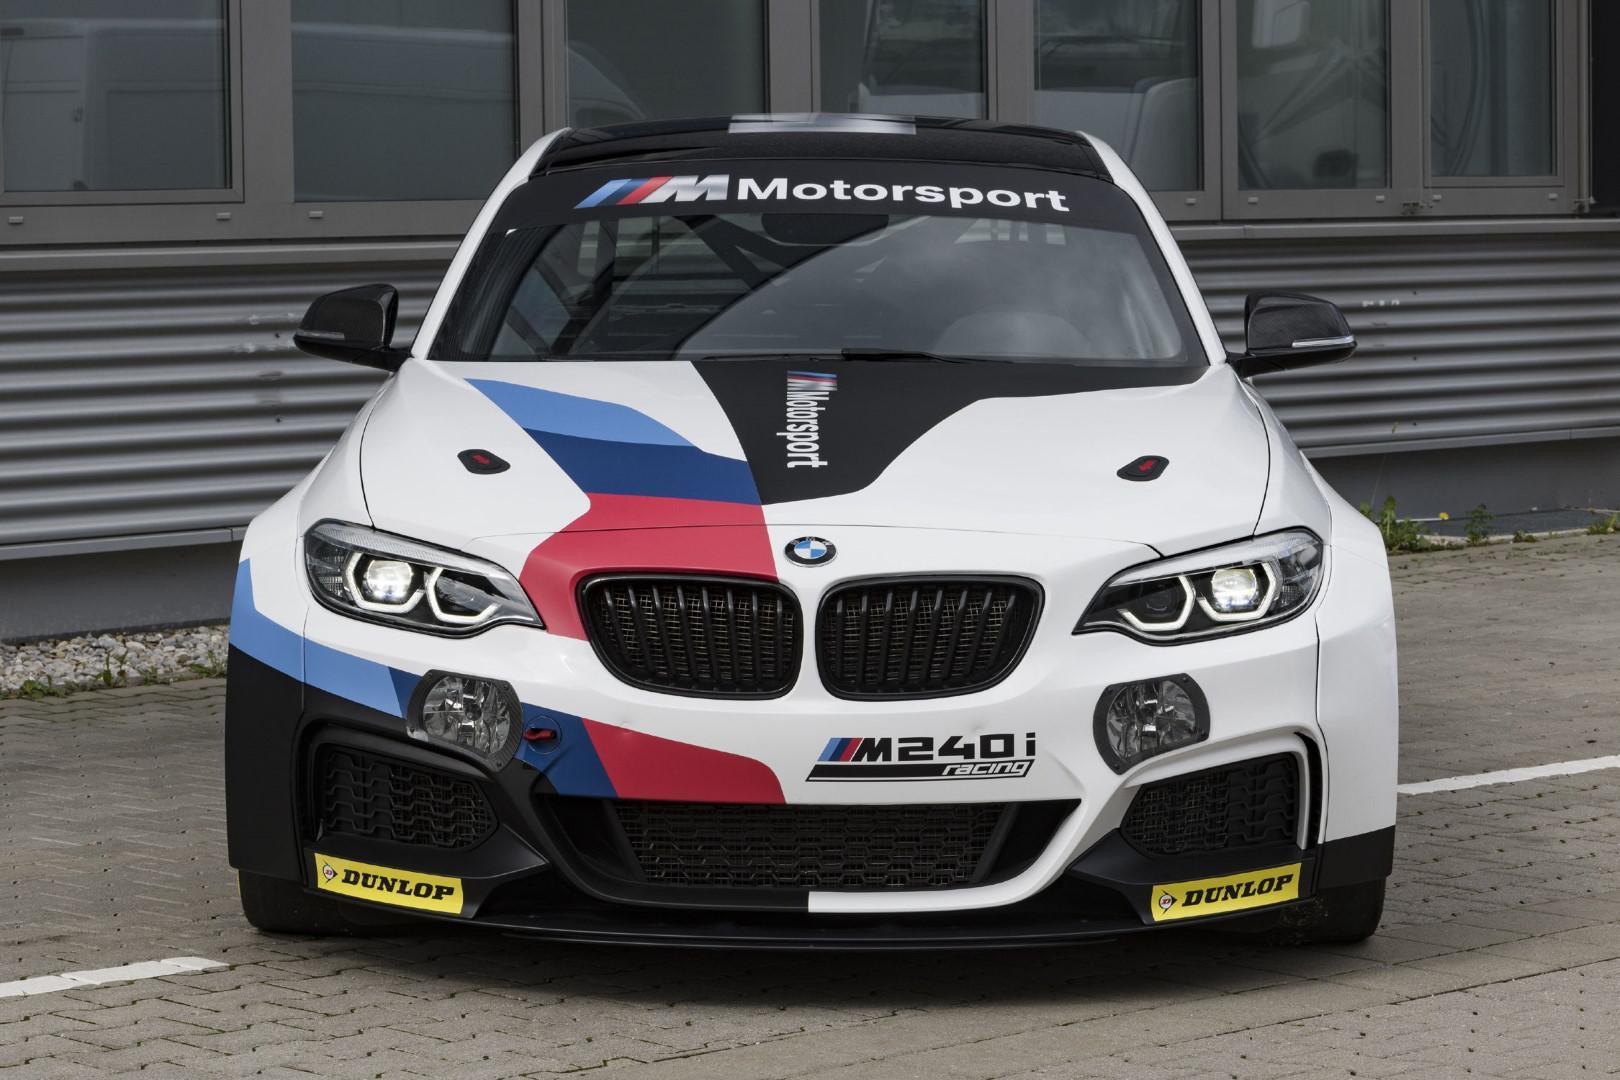 bmw-m235i-racing-cup-pack-evo-877-4.jpg